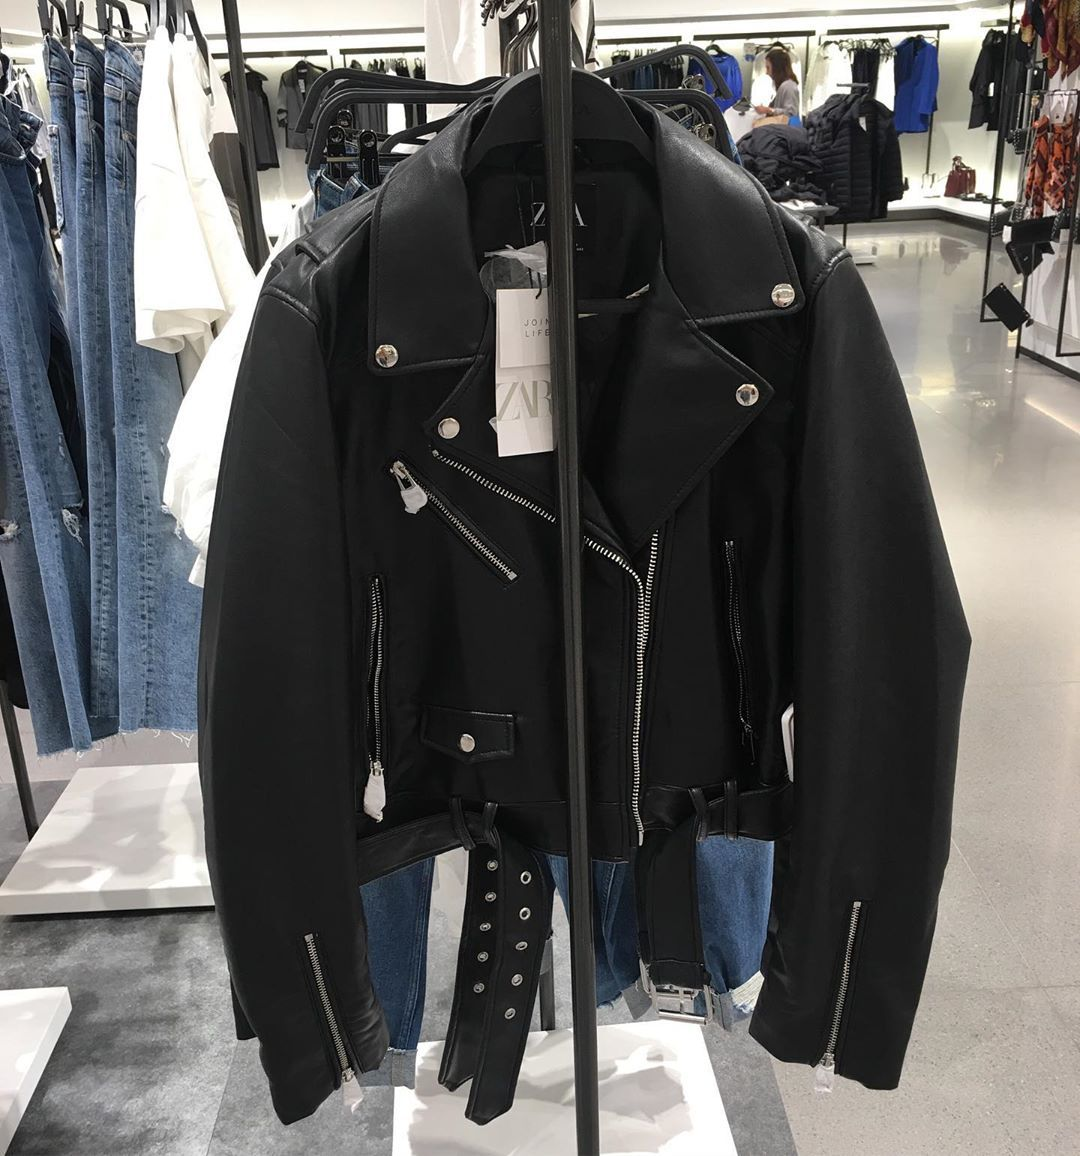 Zara Deri Ceket 299 95 Kadin Women Moda Fashion Stil Style Womenfashionstyle Styleblogger Fashionblogger Alisveris Shop Deri Ceket Moda Shopping